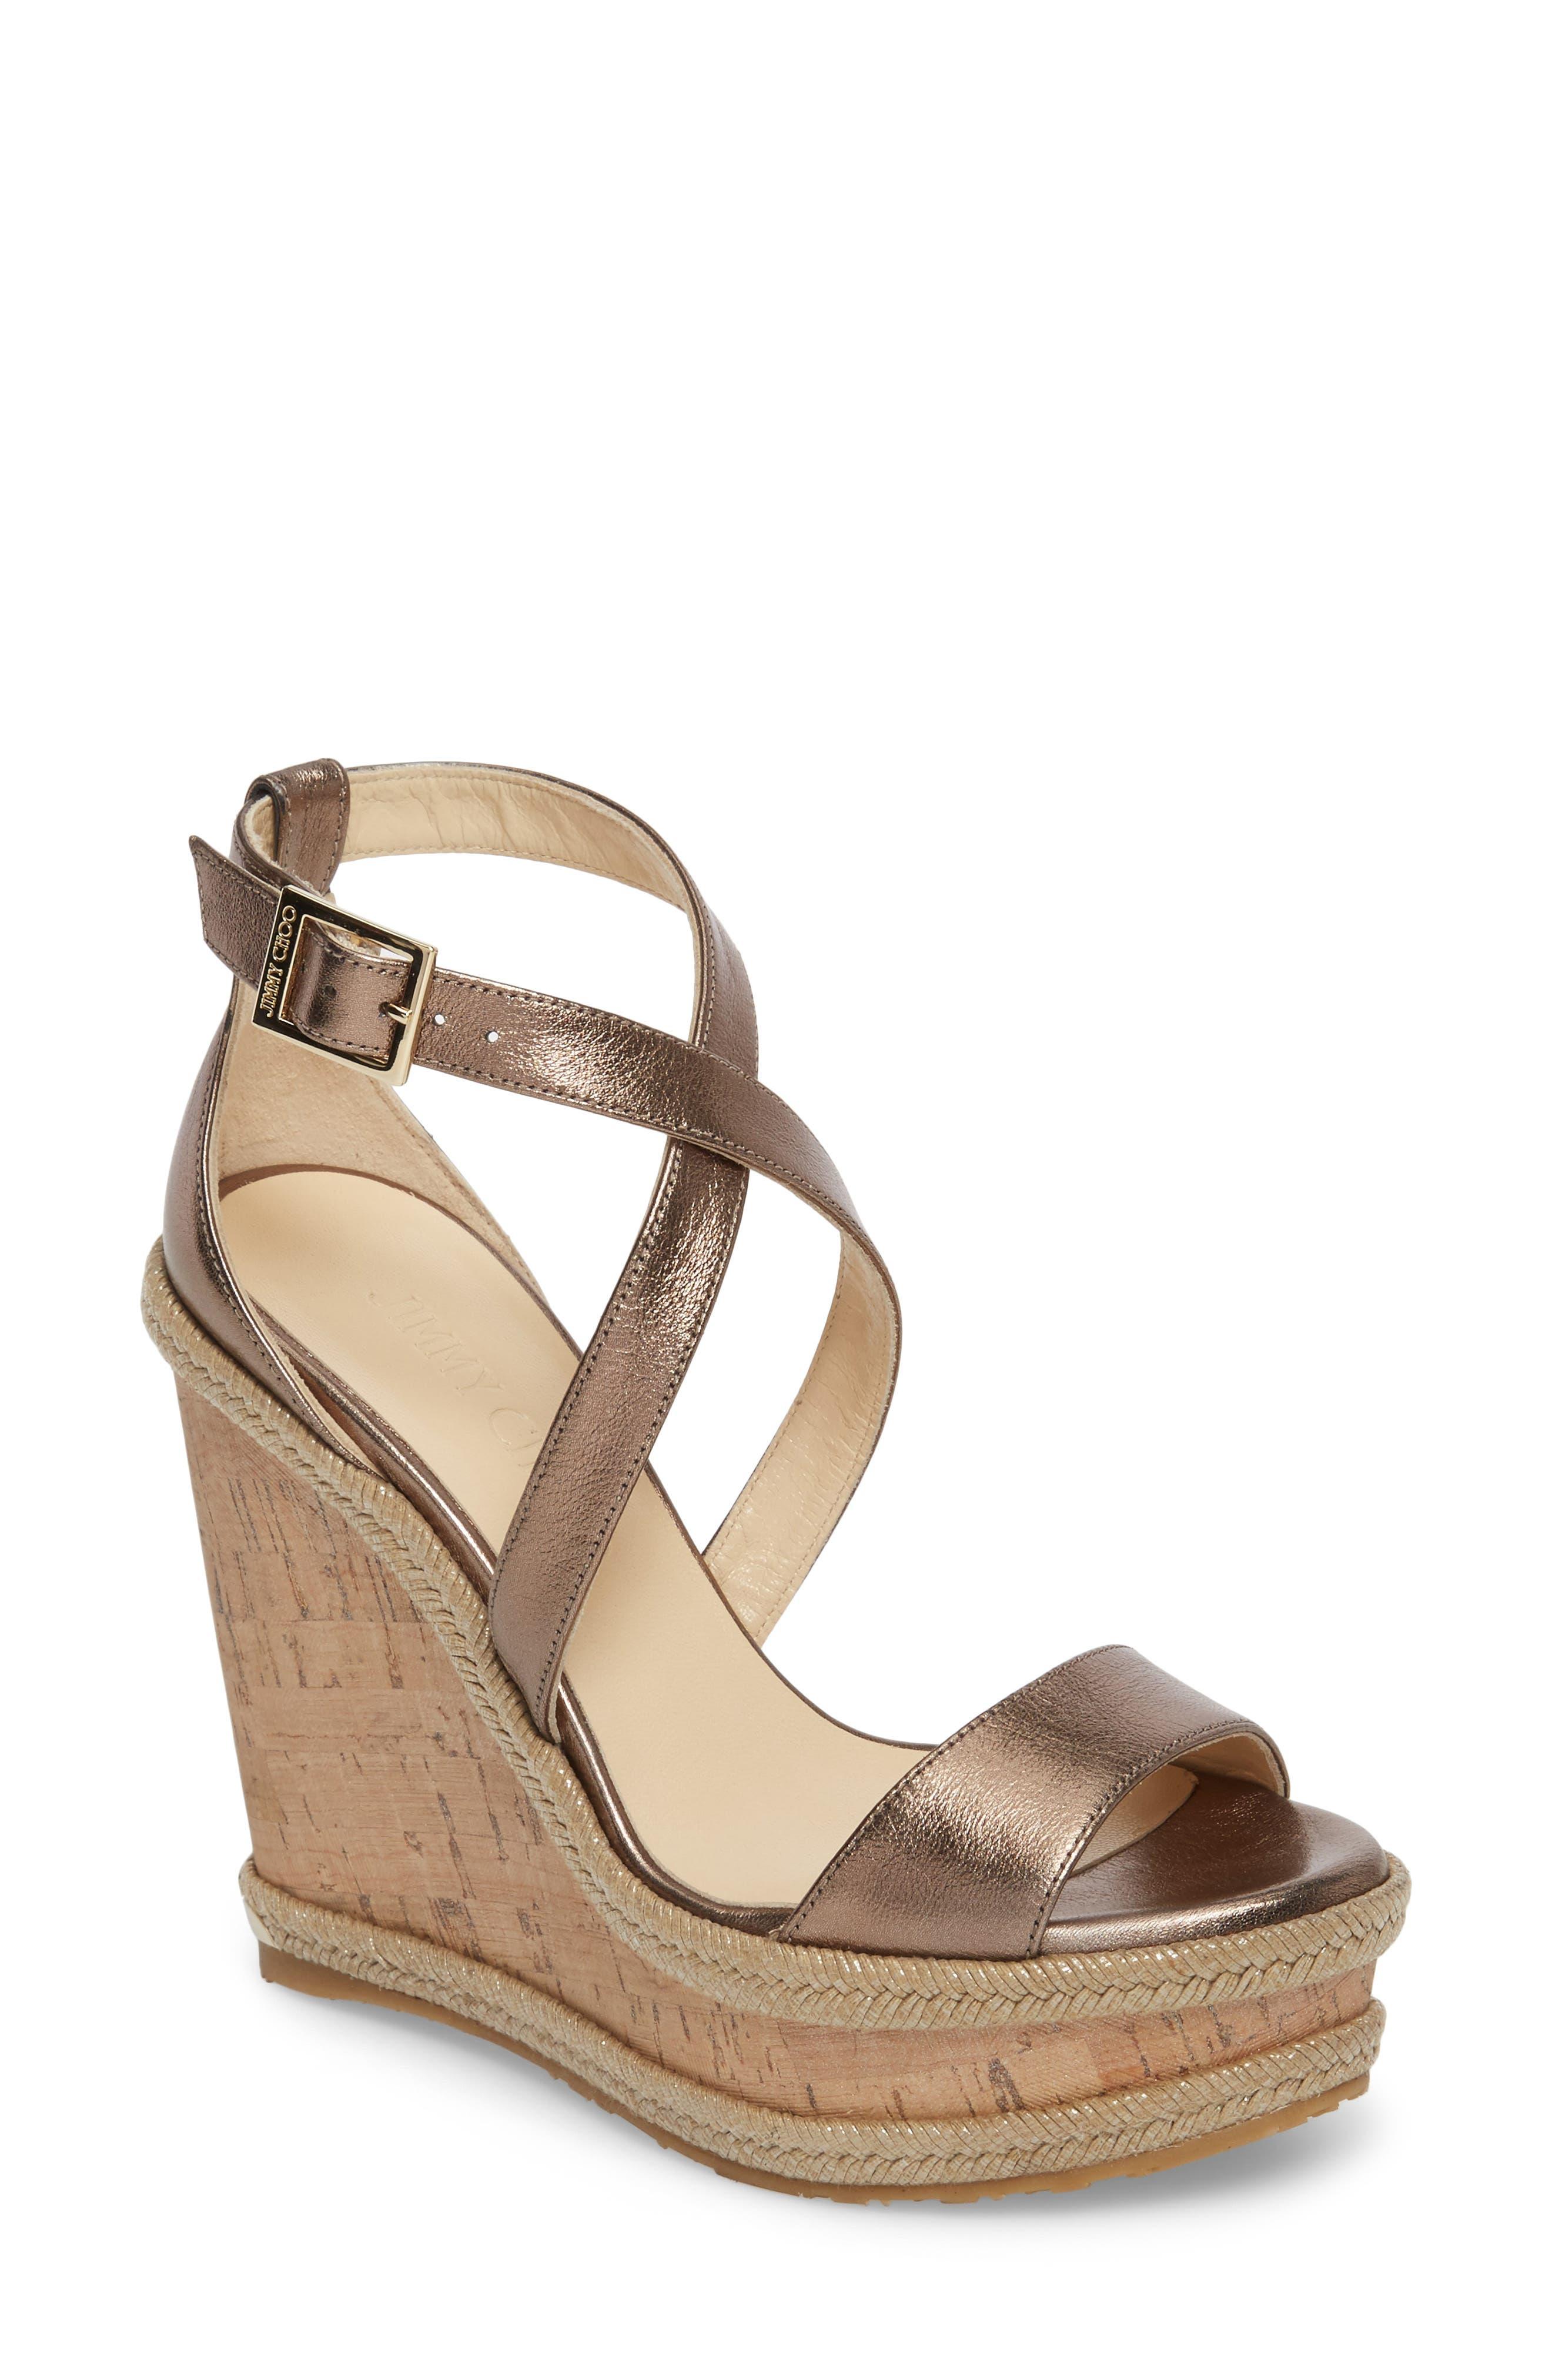 Portia Wedge Platform Sandal,                             Main thumbnail 1, color,                             710